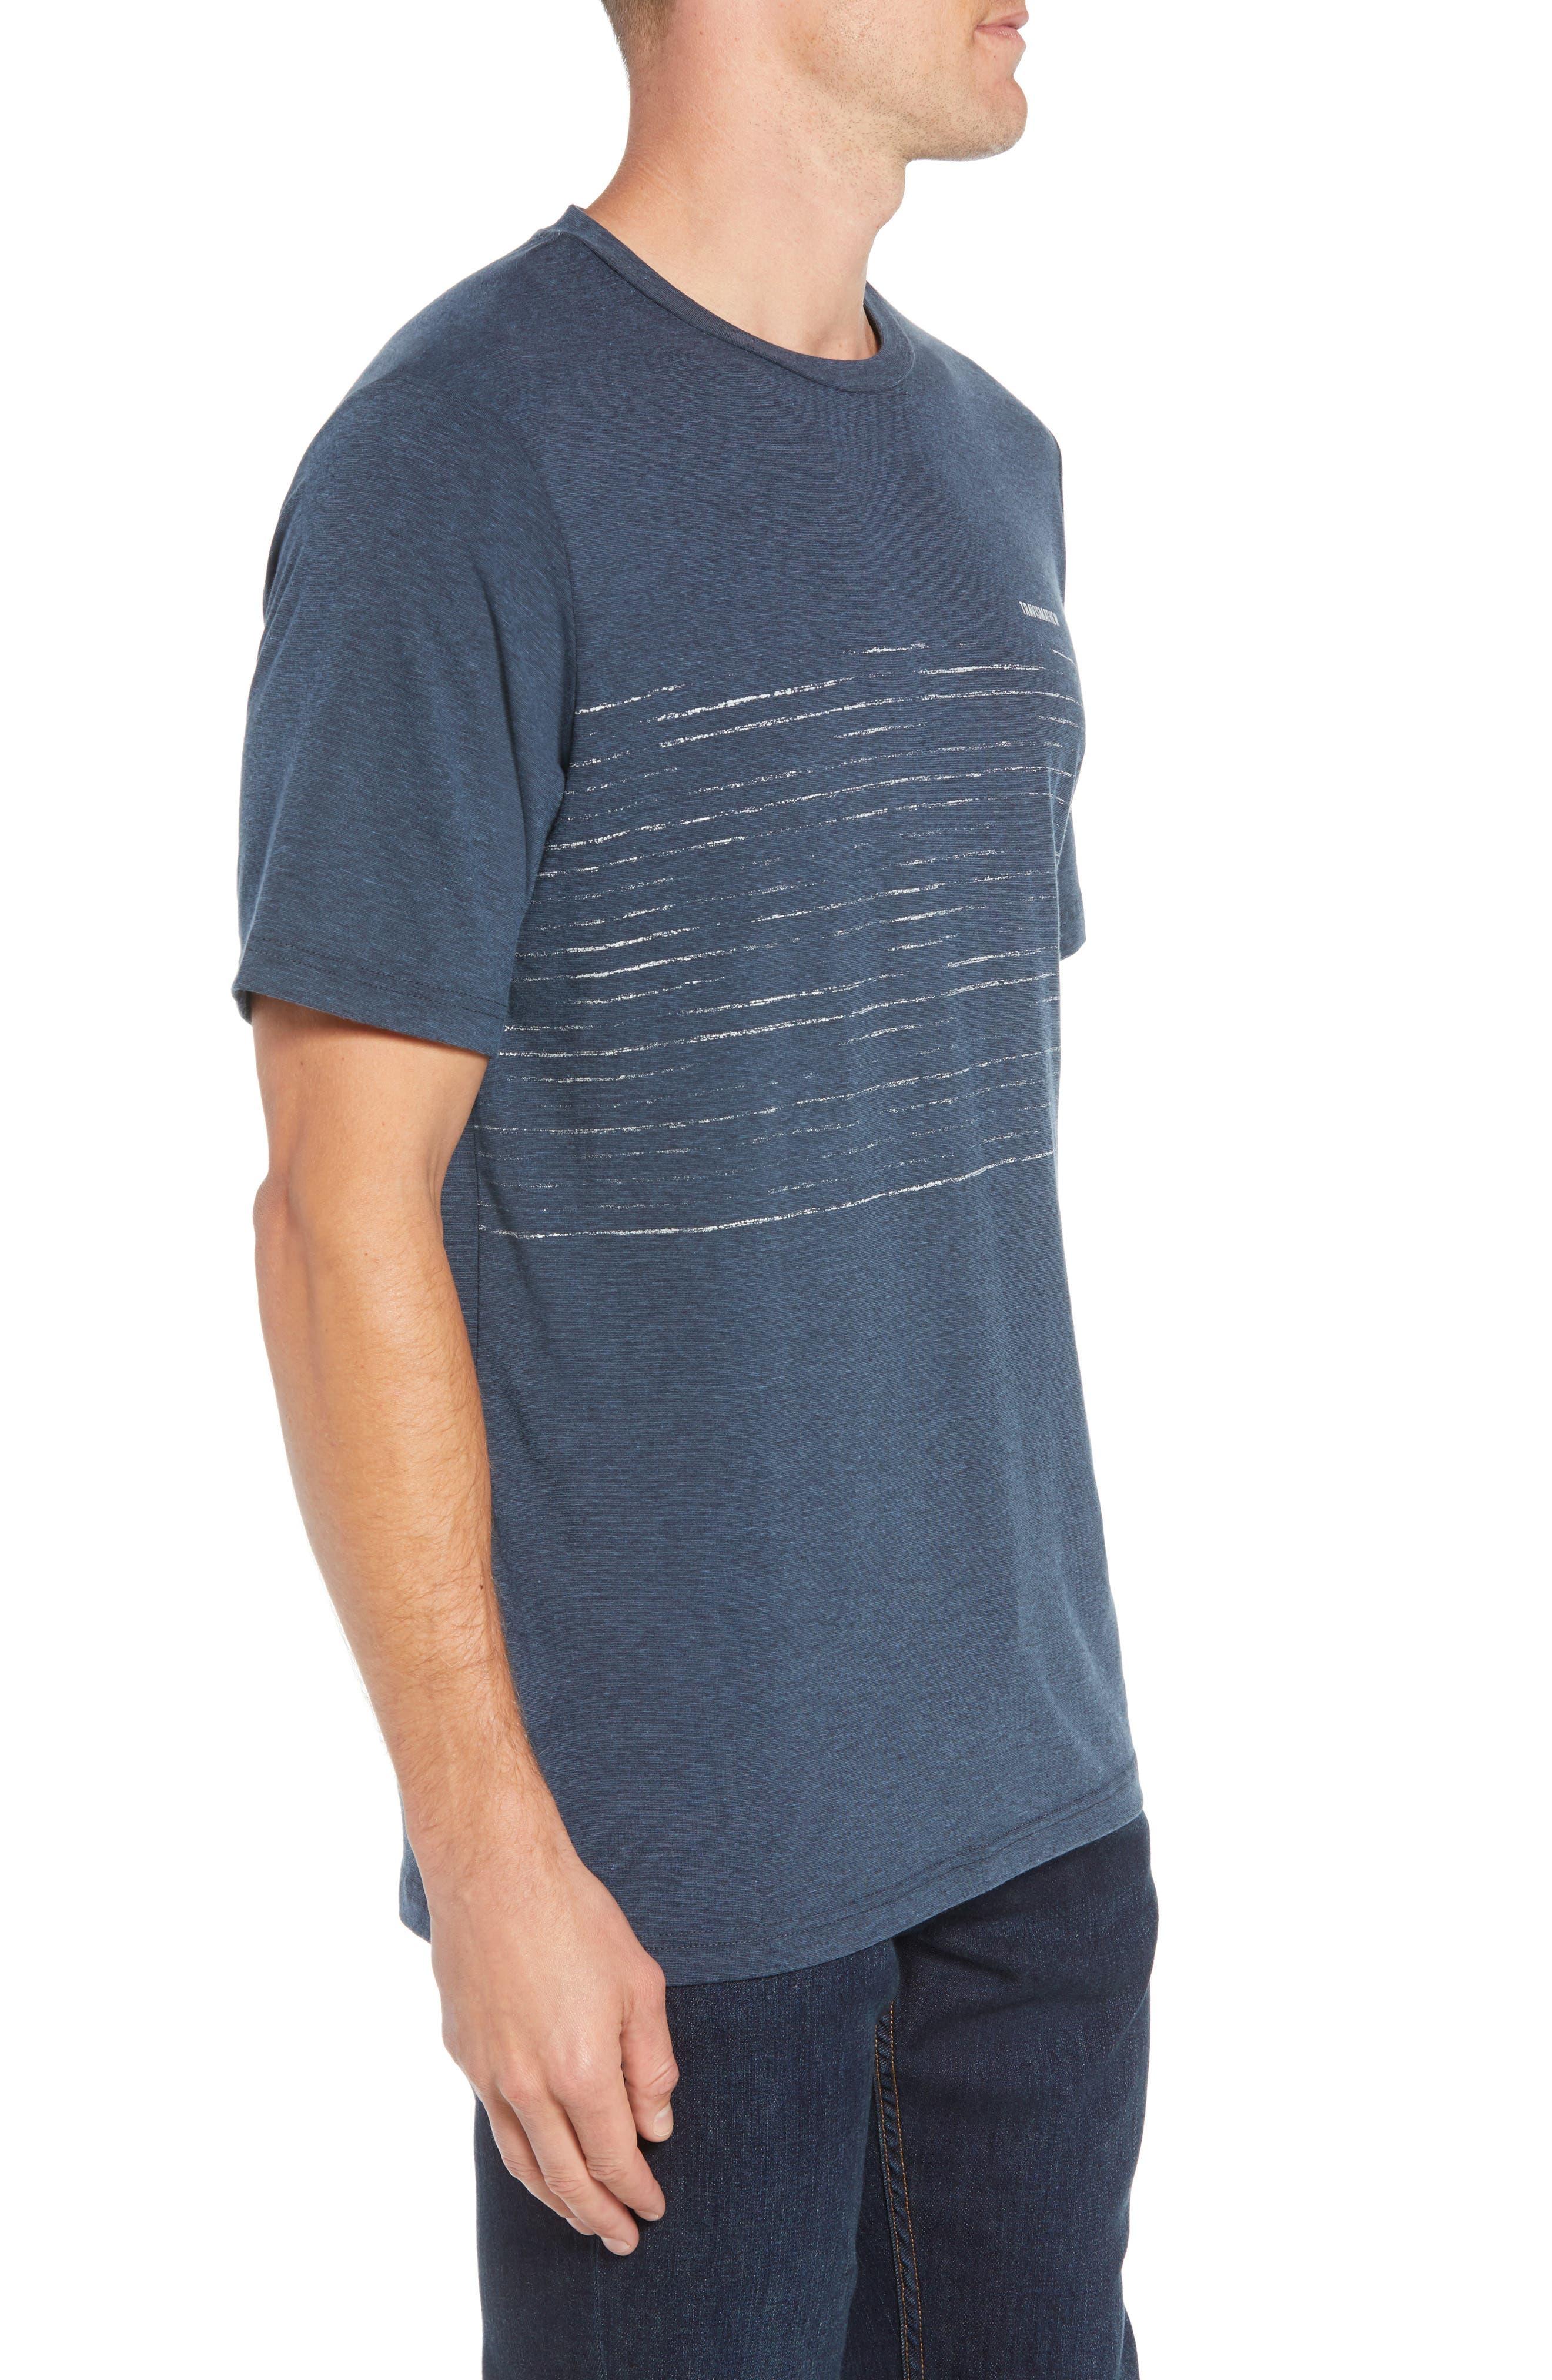 Laze T-Shirt,                             Alternate thumbnail 3, color,                             TRUE NAVY/ BLACK